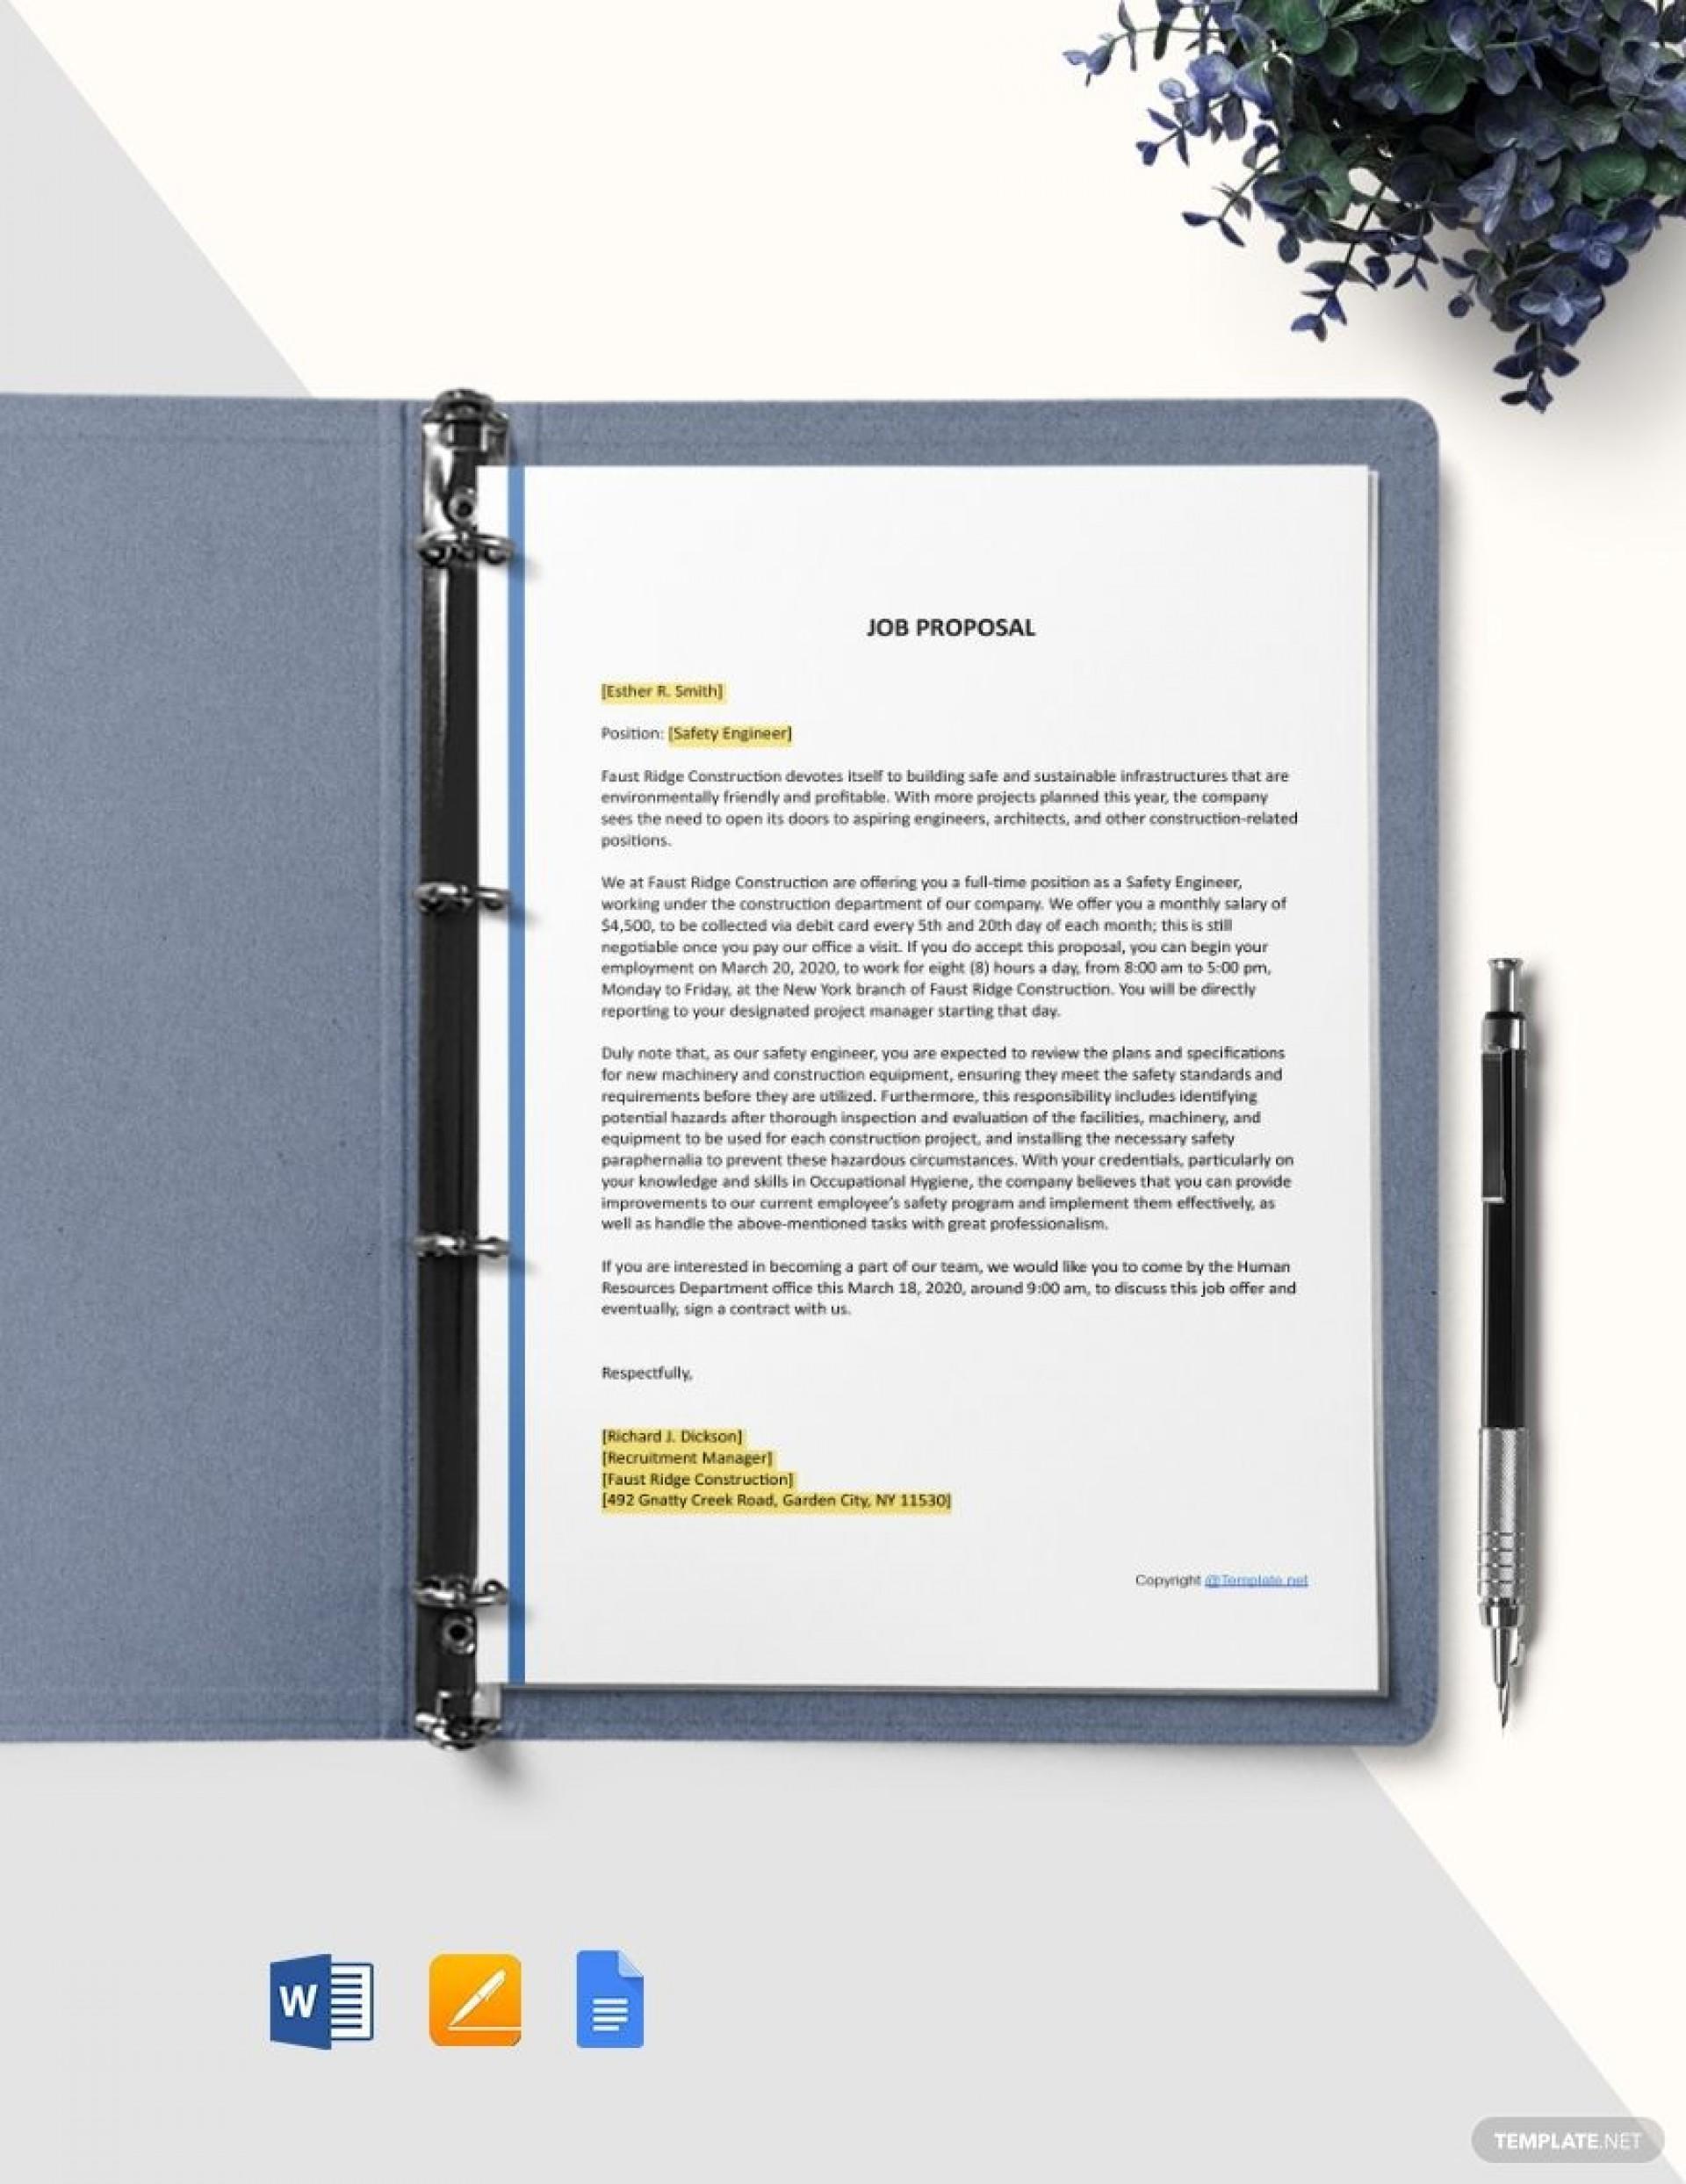 004 Impressive Microsoft Word Job Proposal Template Concept 1920